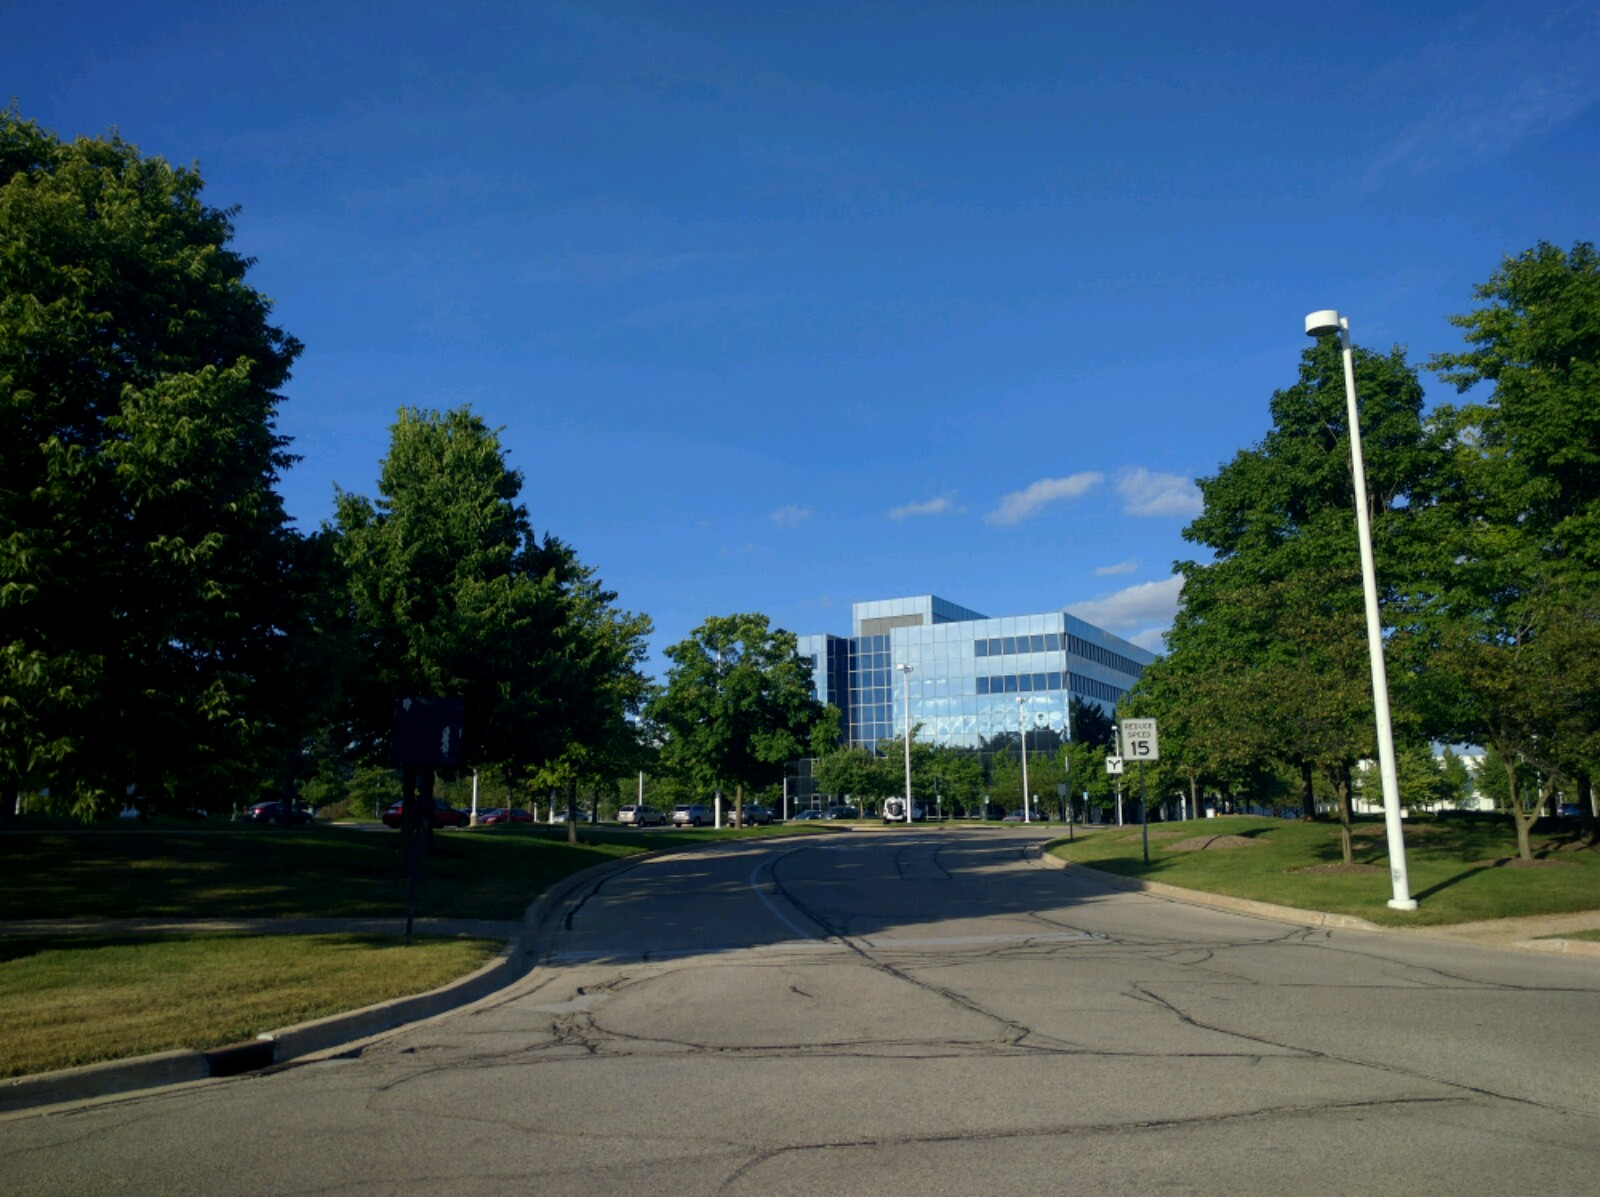 Sears Holdings' corporate headquarters in Hoffman Estates, Illinois.